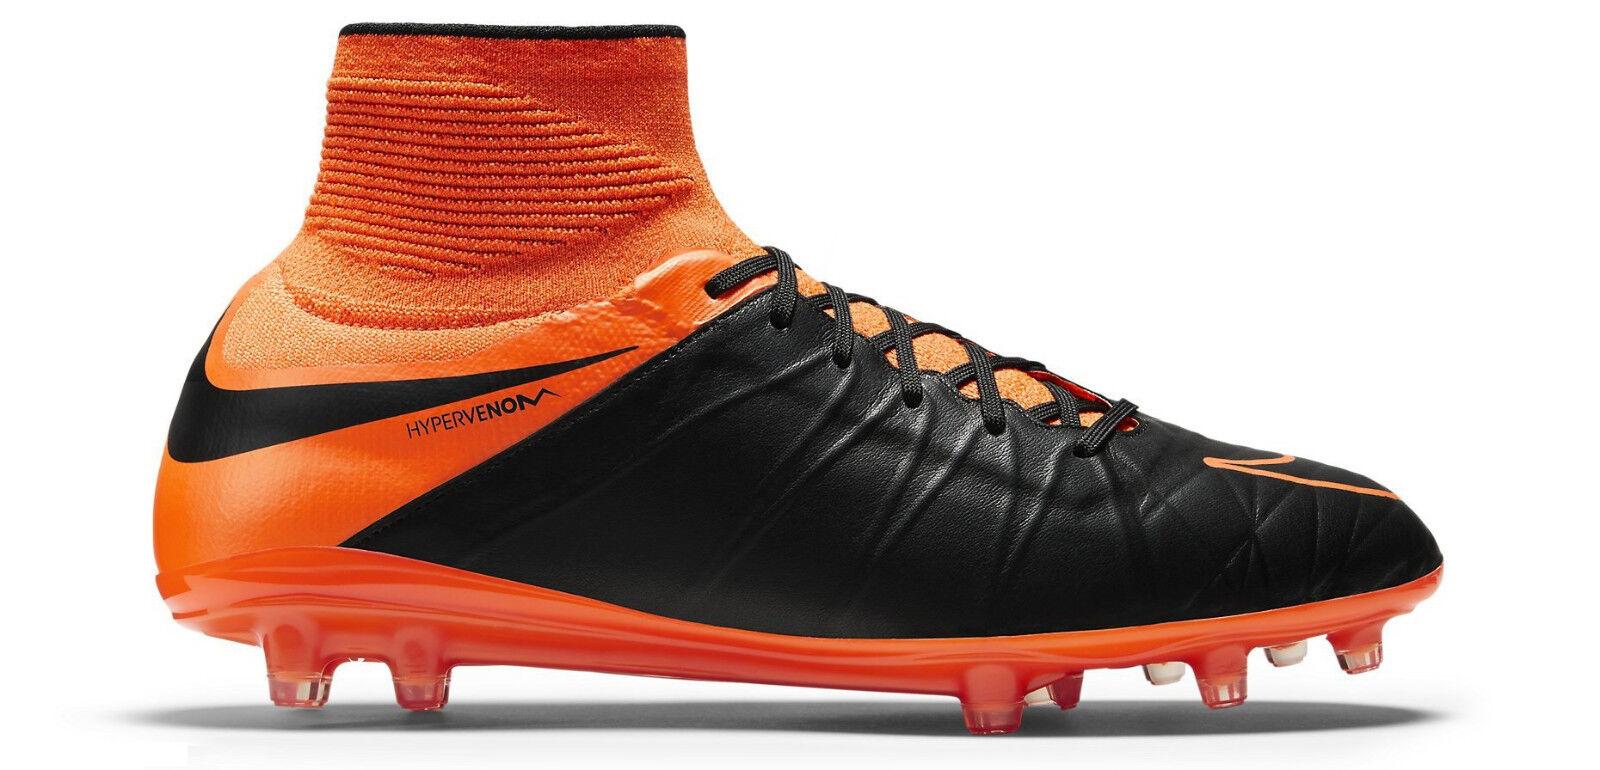 Nike Hypervenom Phantom II FG Soccer Cleats Comfortable Cheap women's shoes women's shoes